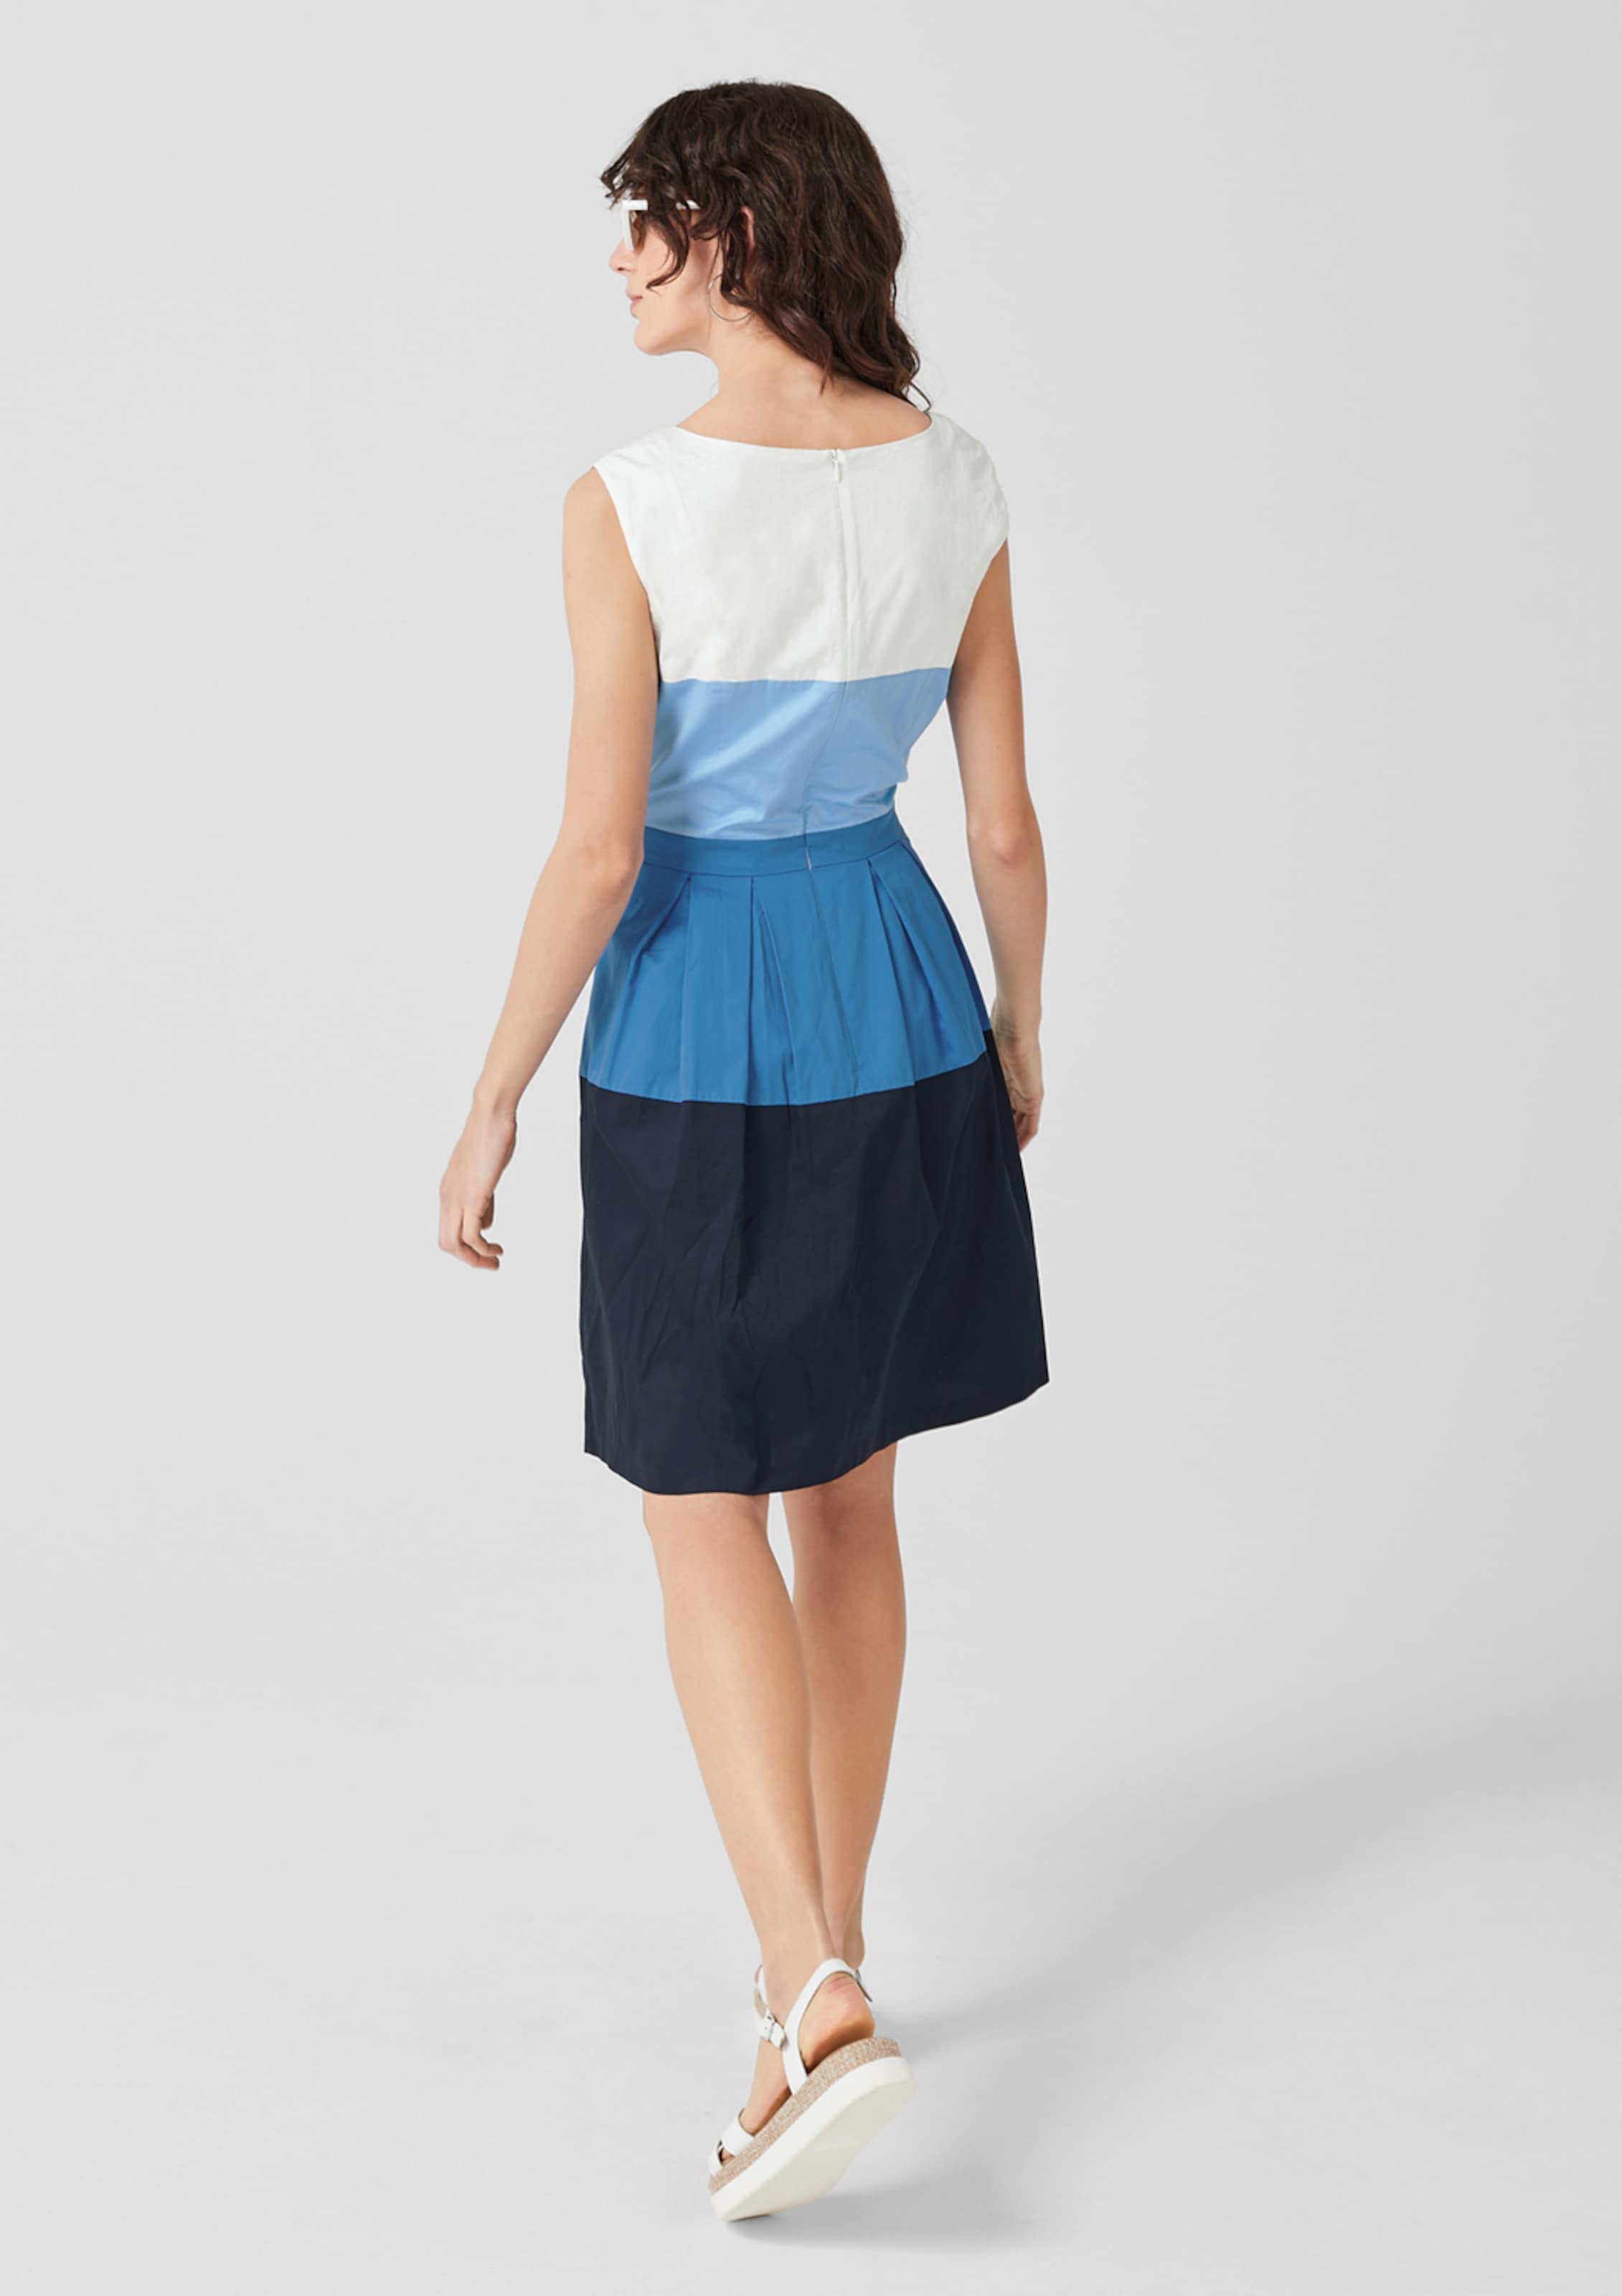 Label S Red In BlauWeiß oliver Kleid wnP0O8kX